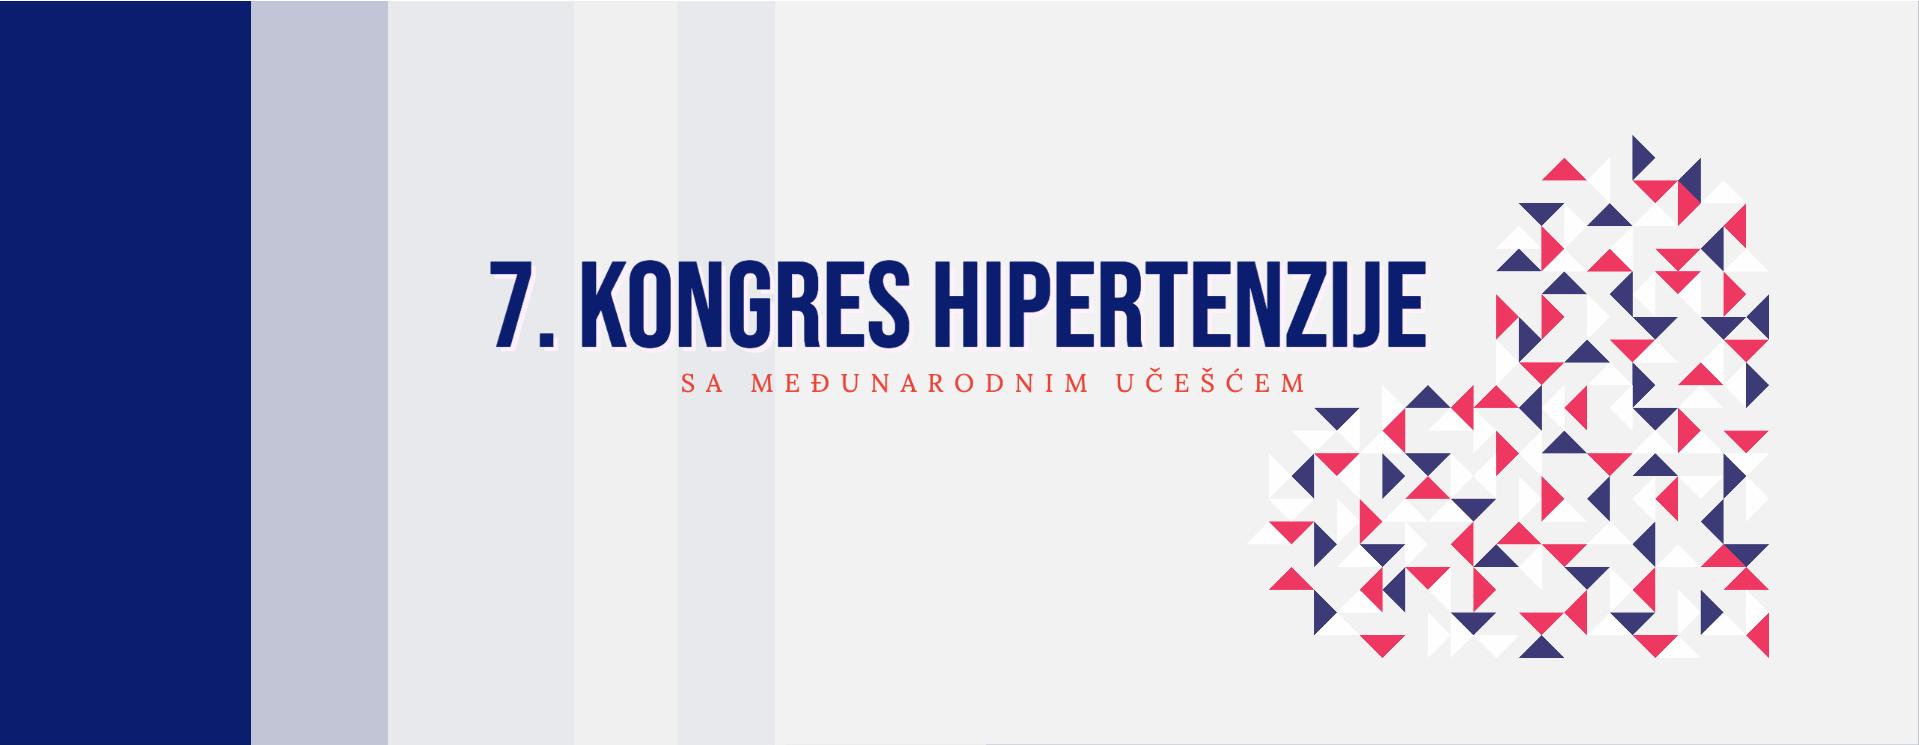 7. Kongres hipertenzije